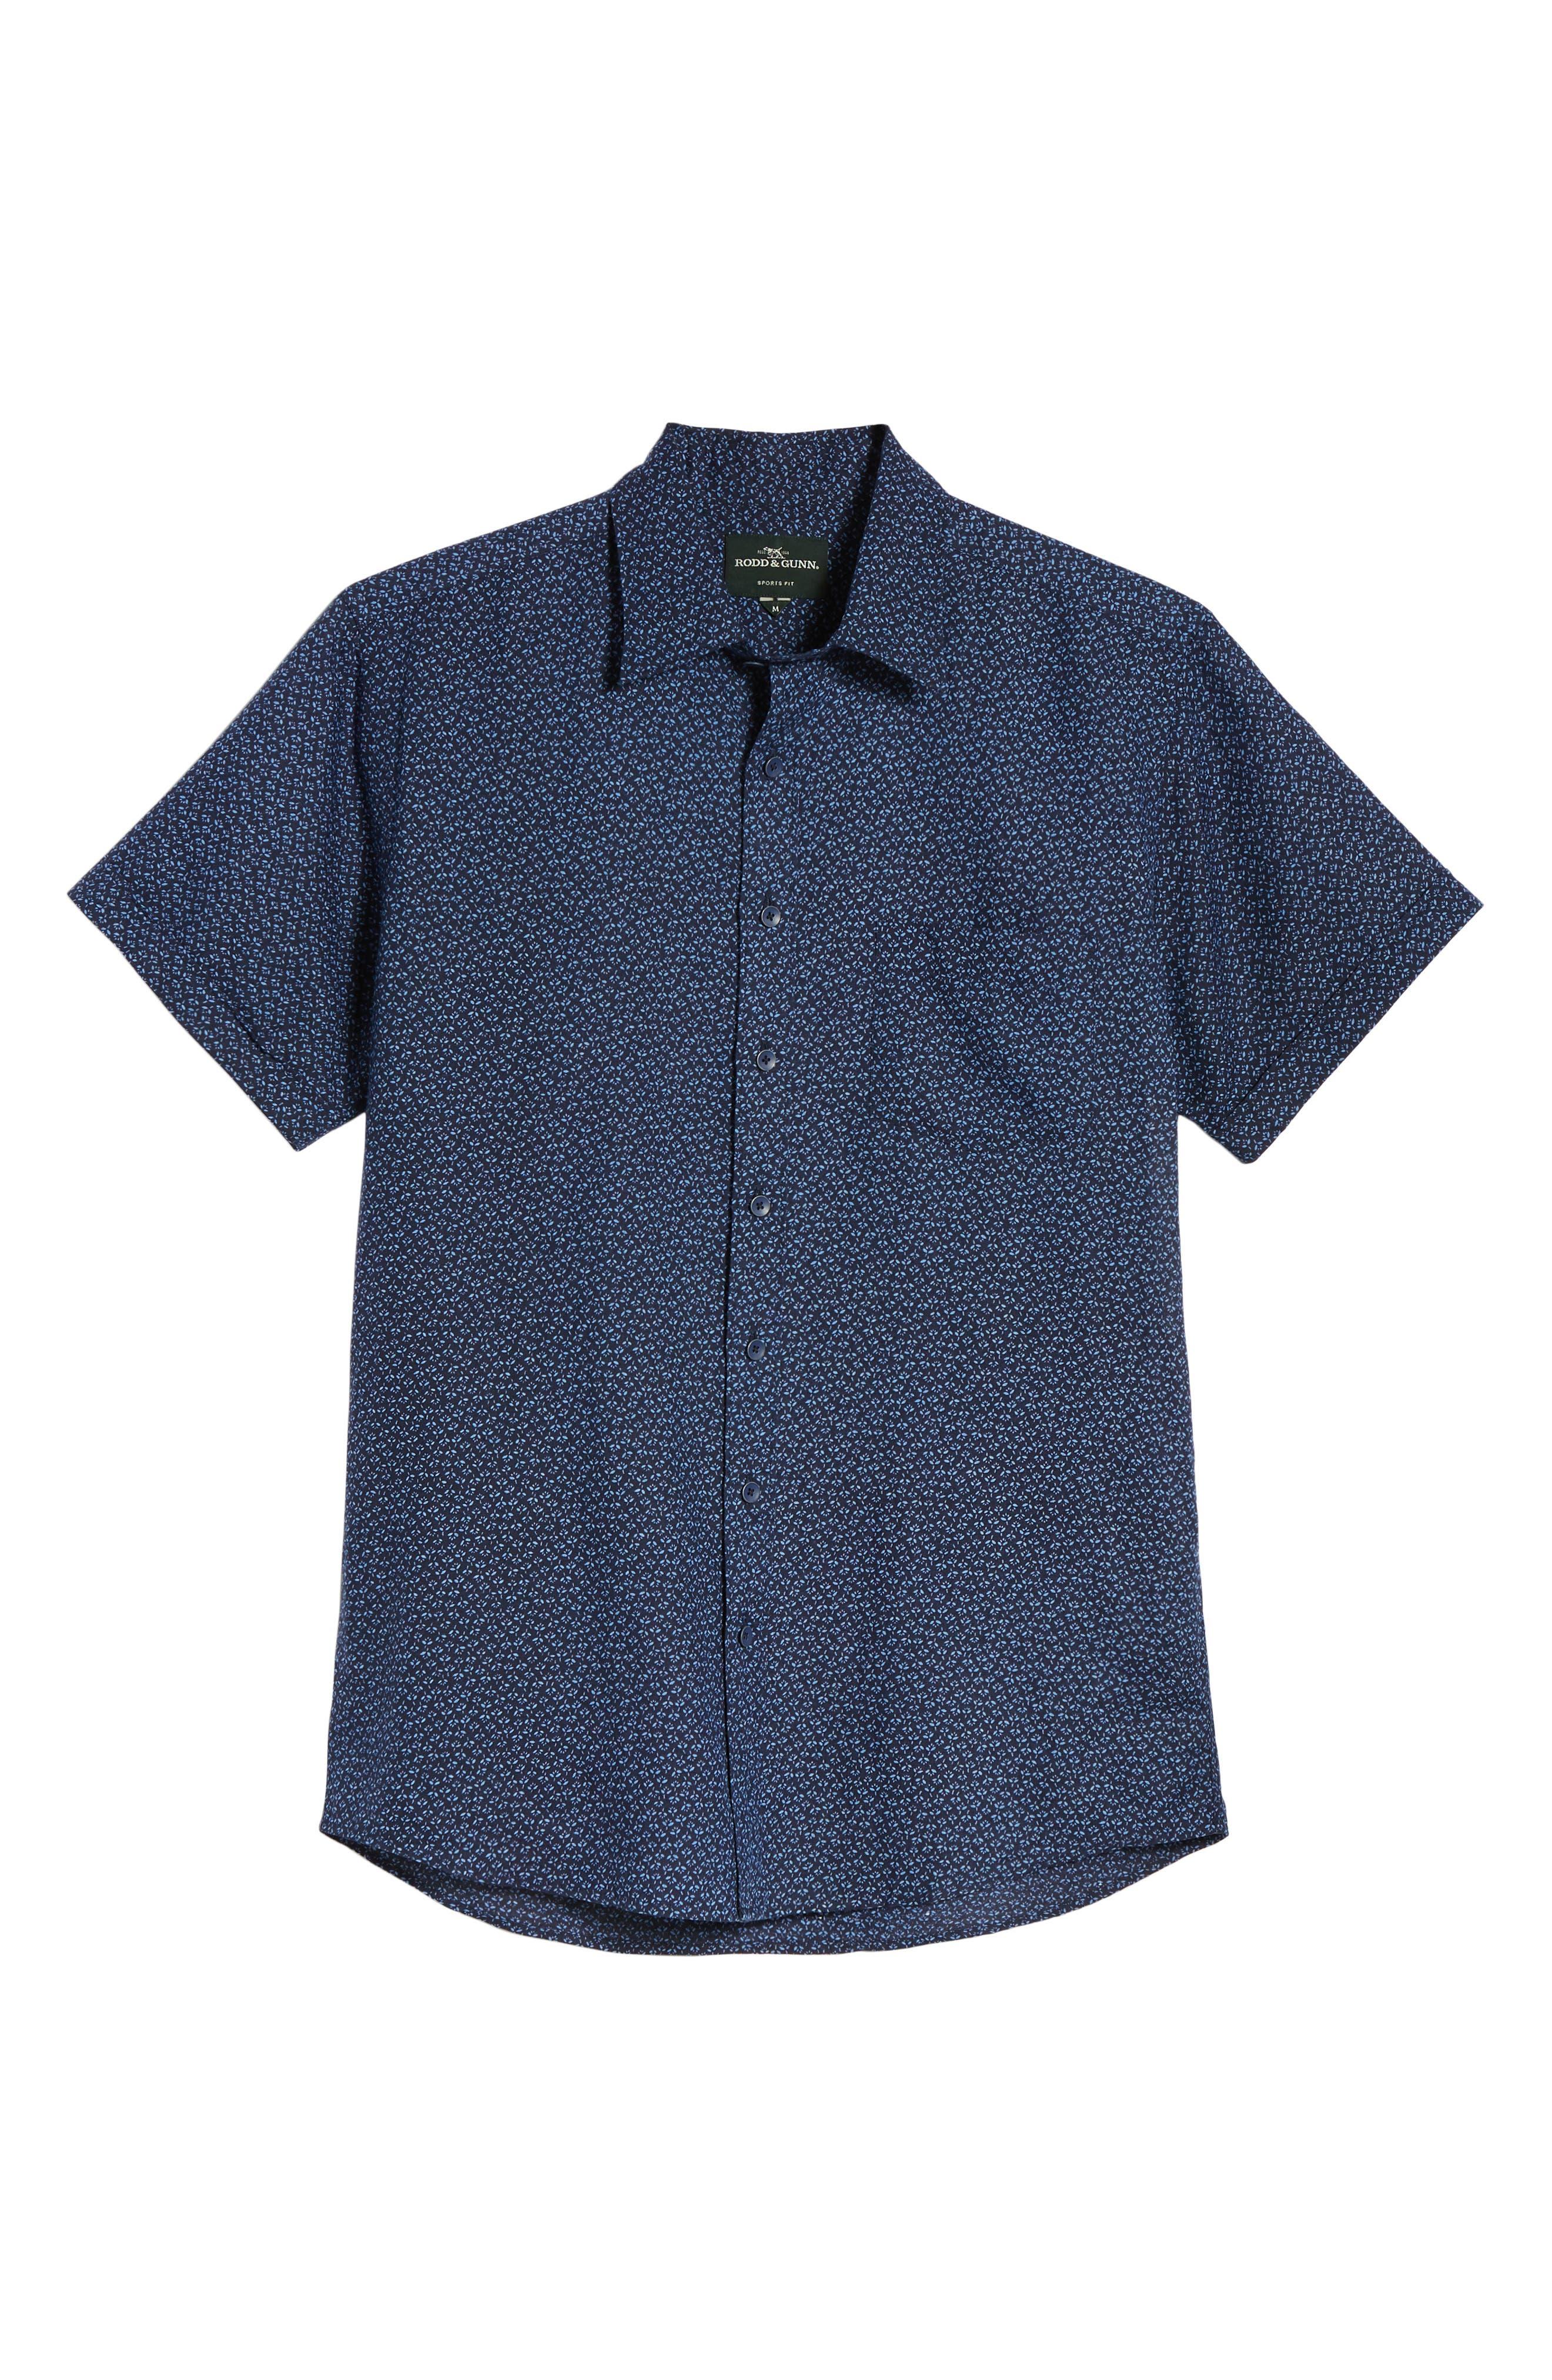 Windermere Linen & Cotton Sport Shirt,                             Alternate thumbnail 6, color,                             INDIGO